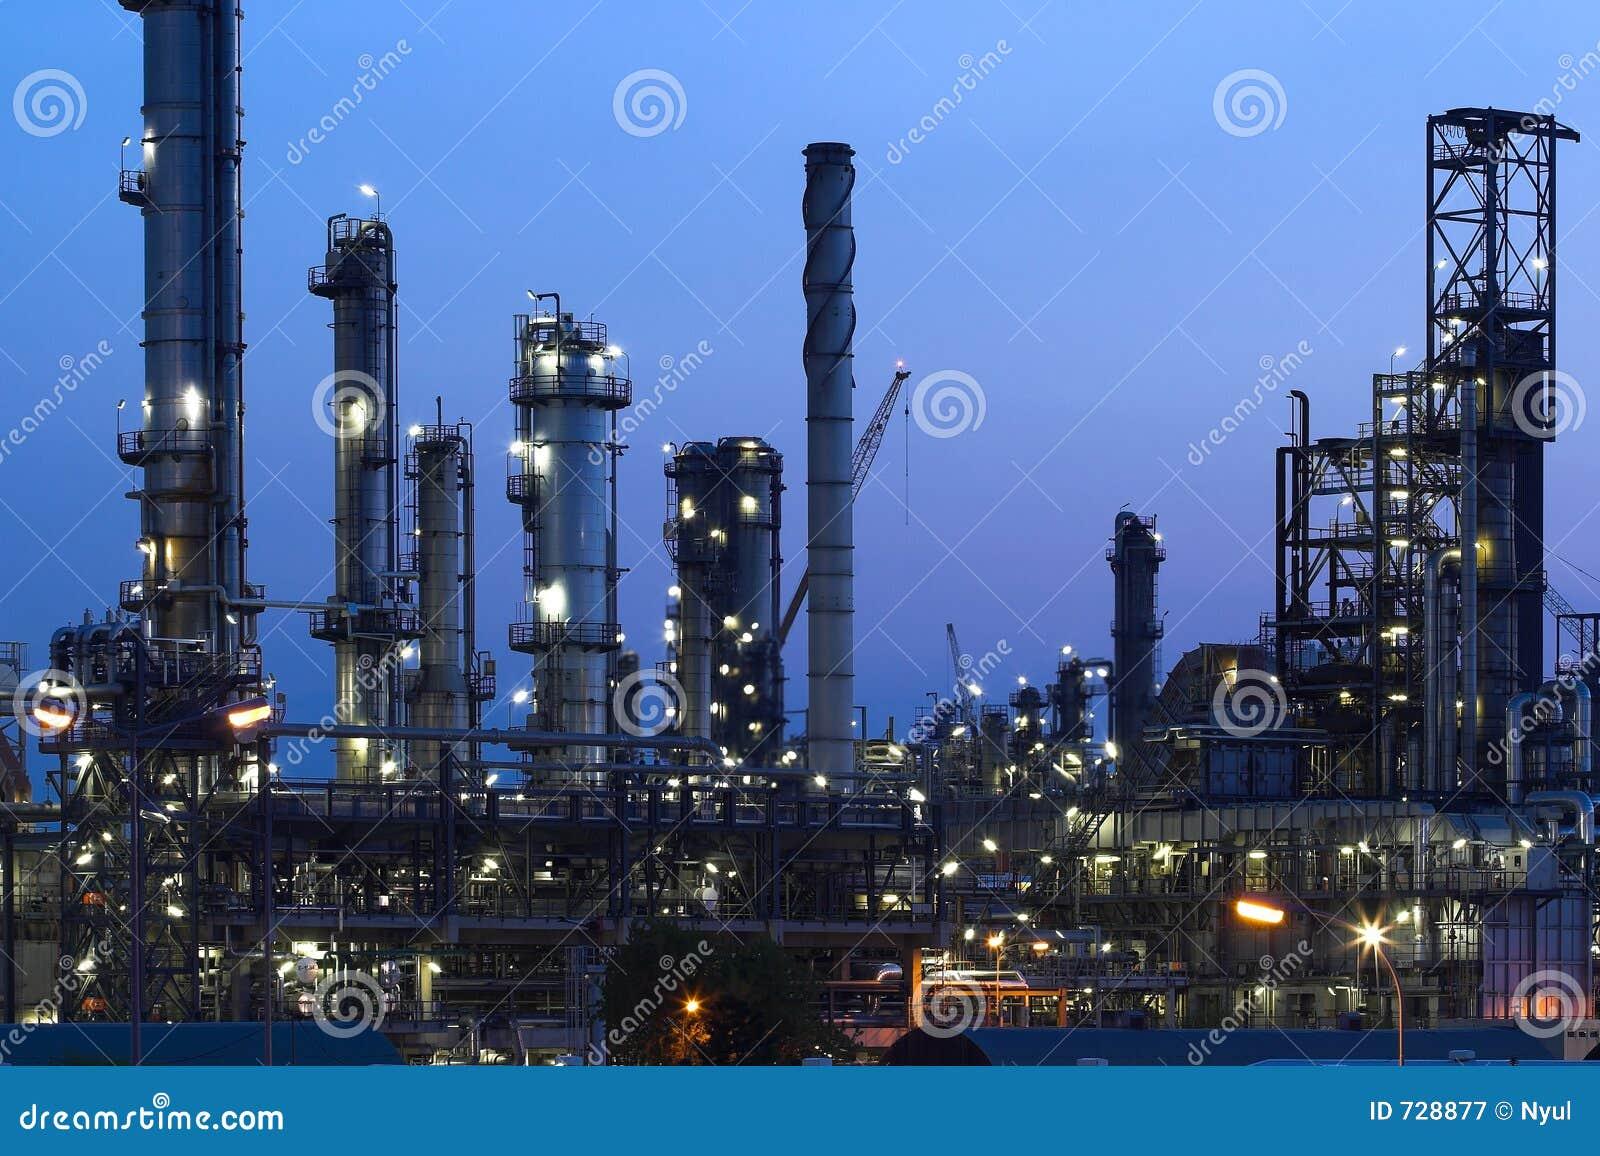 Industry 4.